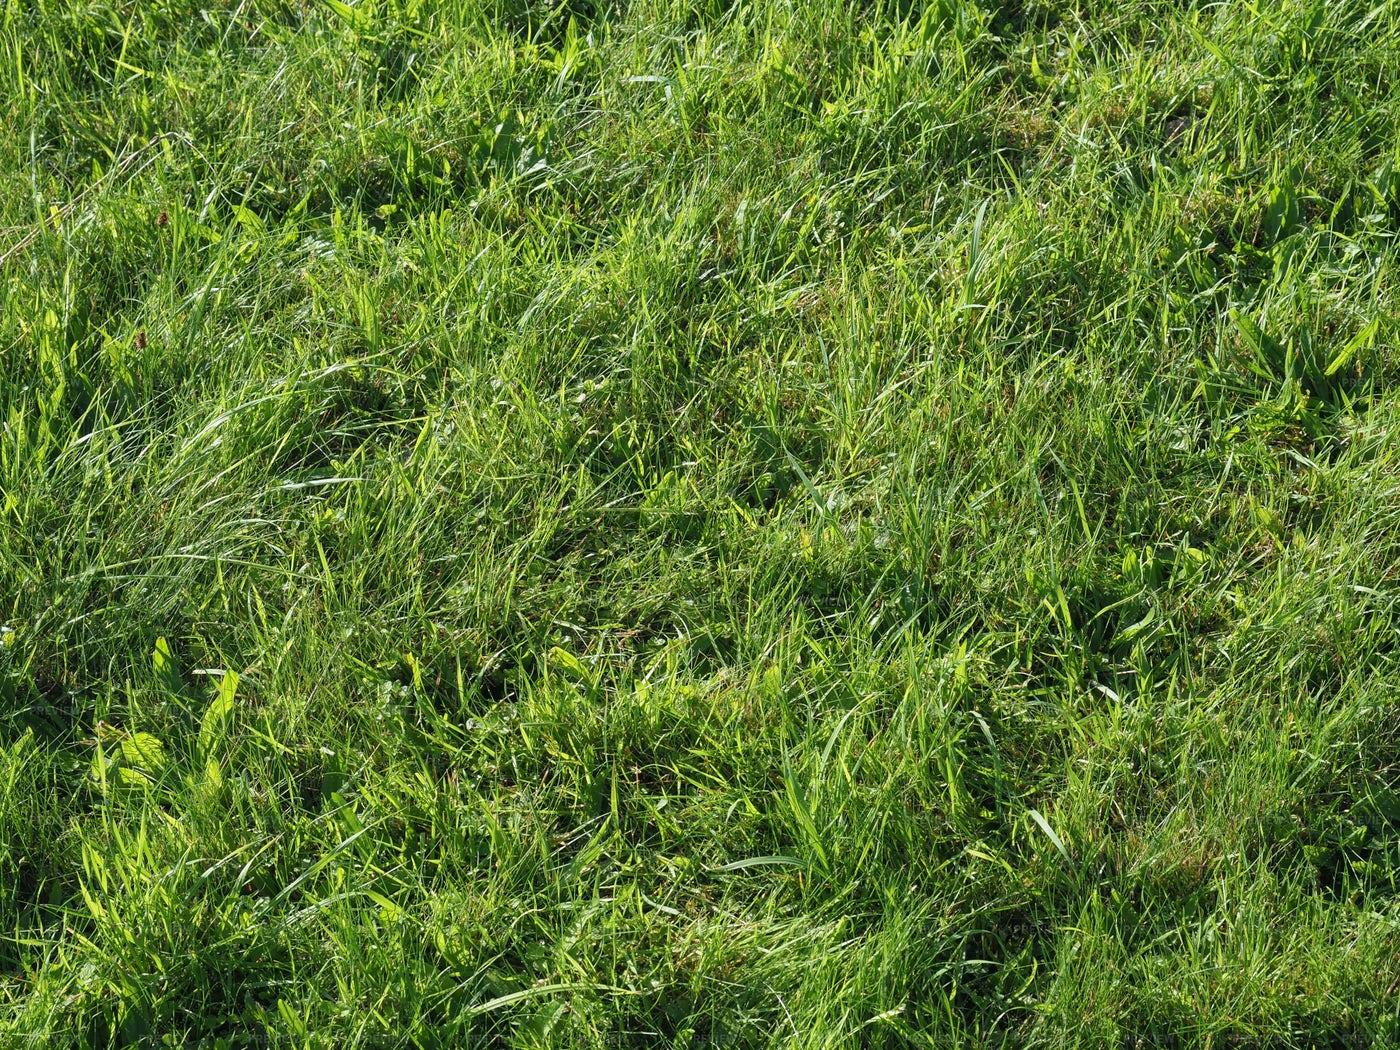 Green Grass Texture Background: Stock Photos